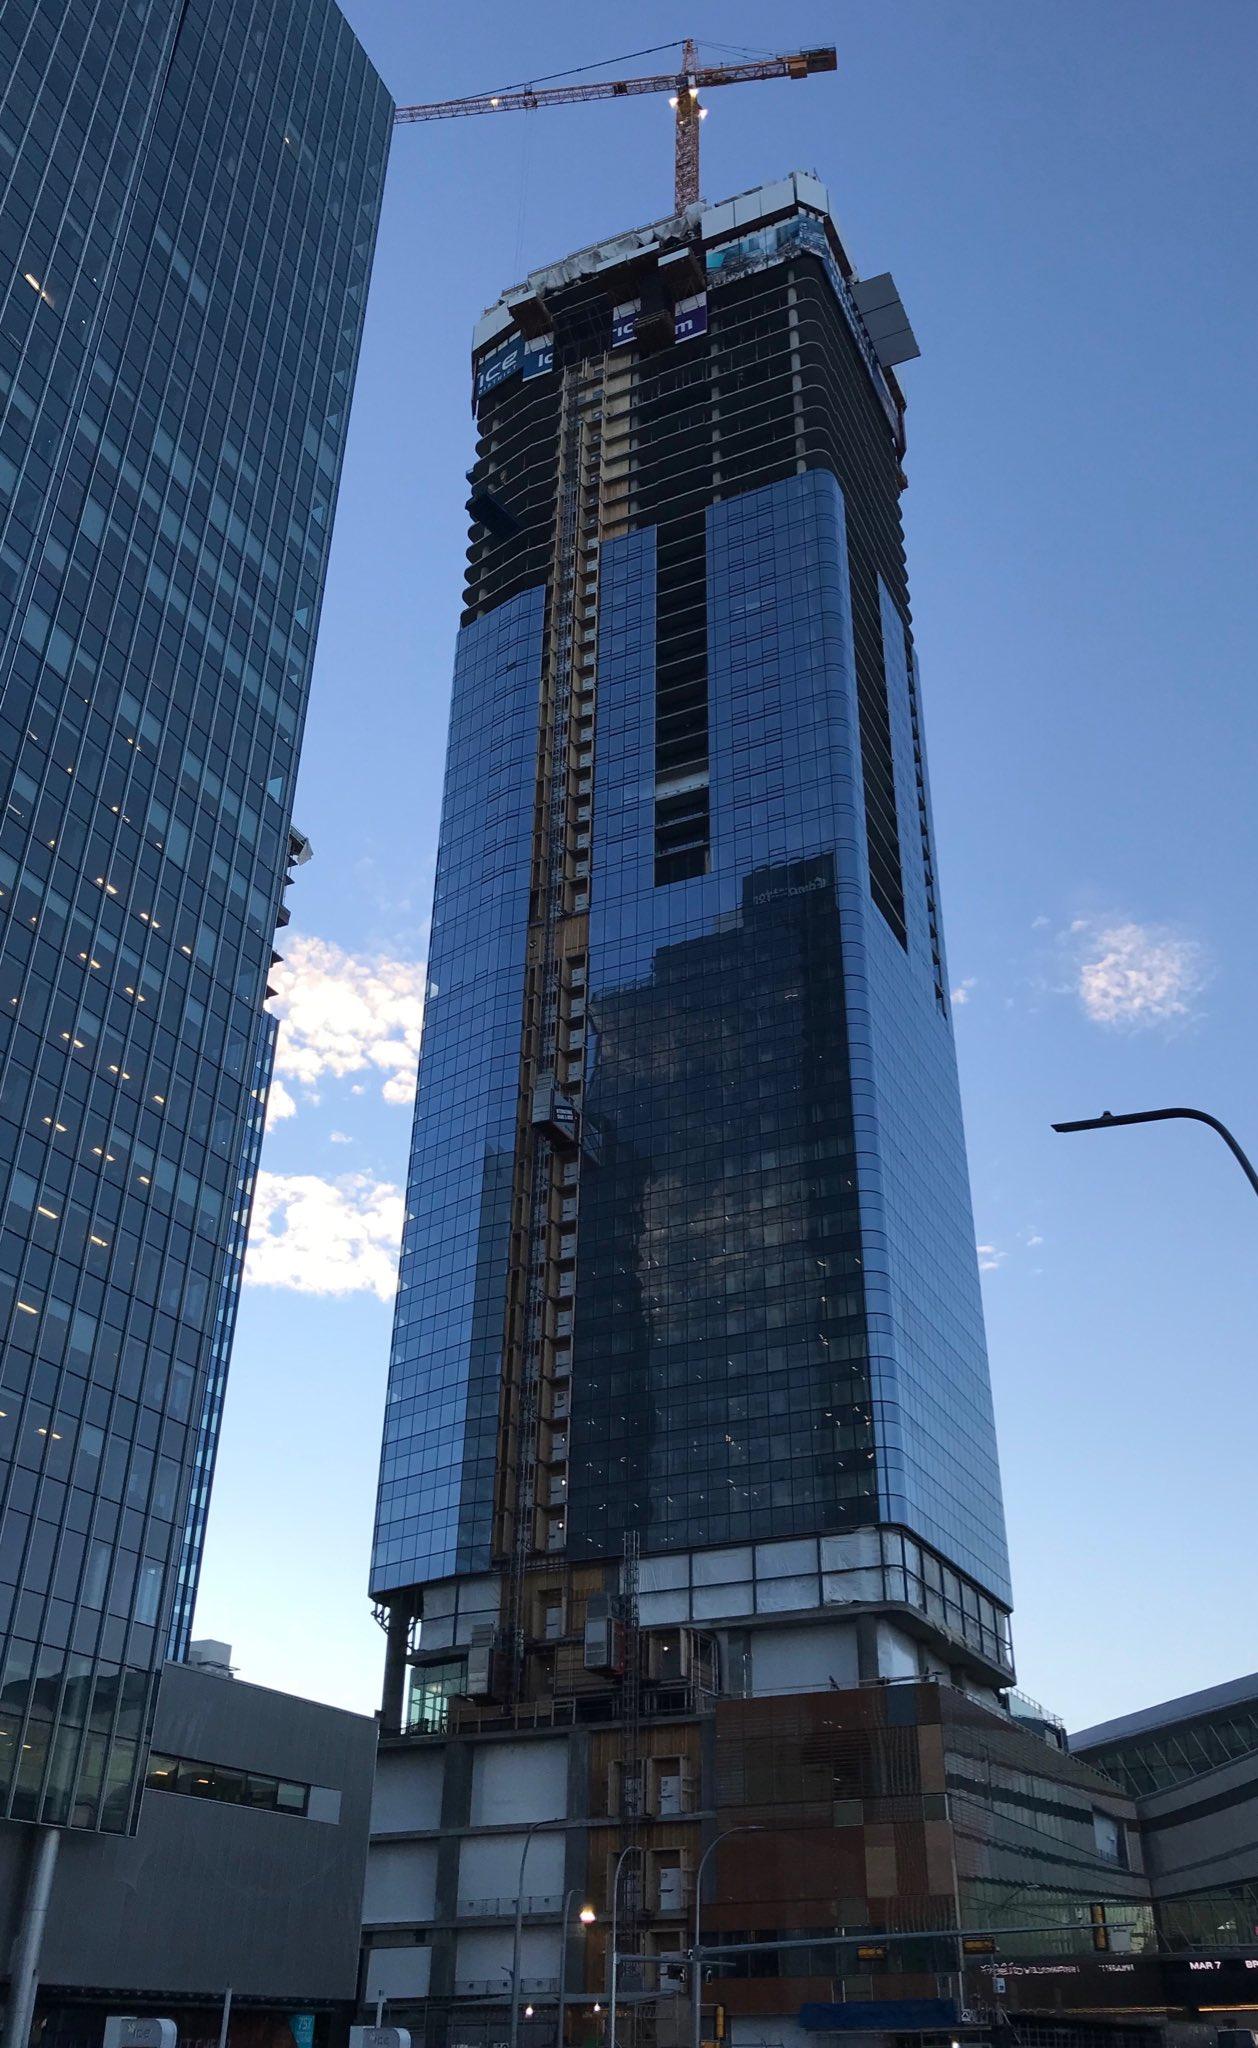 Edmonton: JW Marriott Hotel & Residences